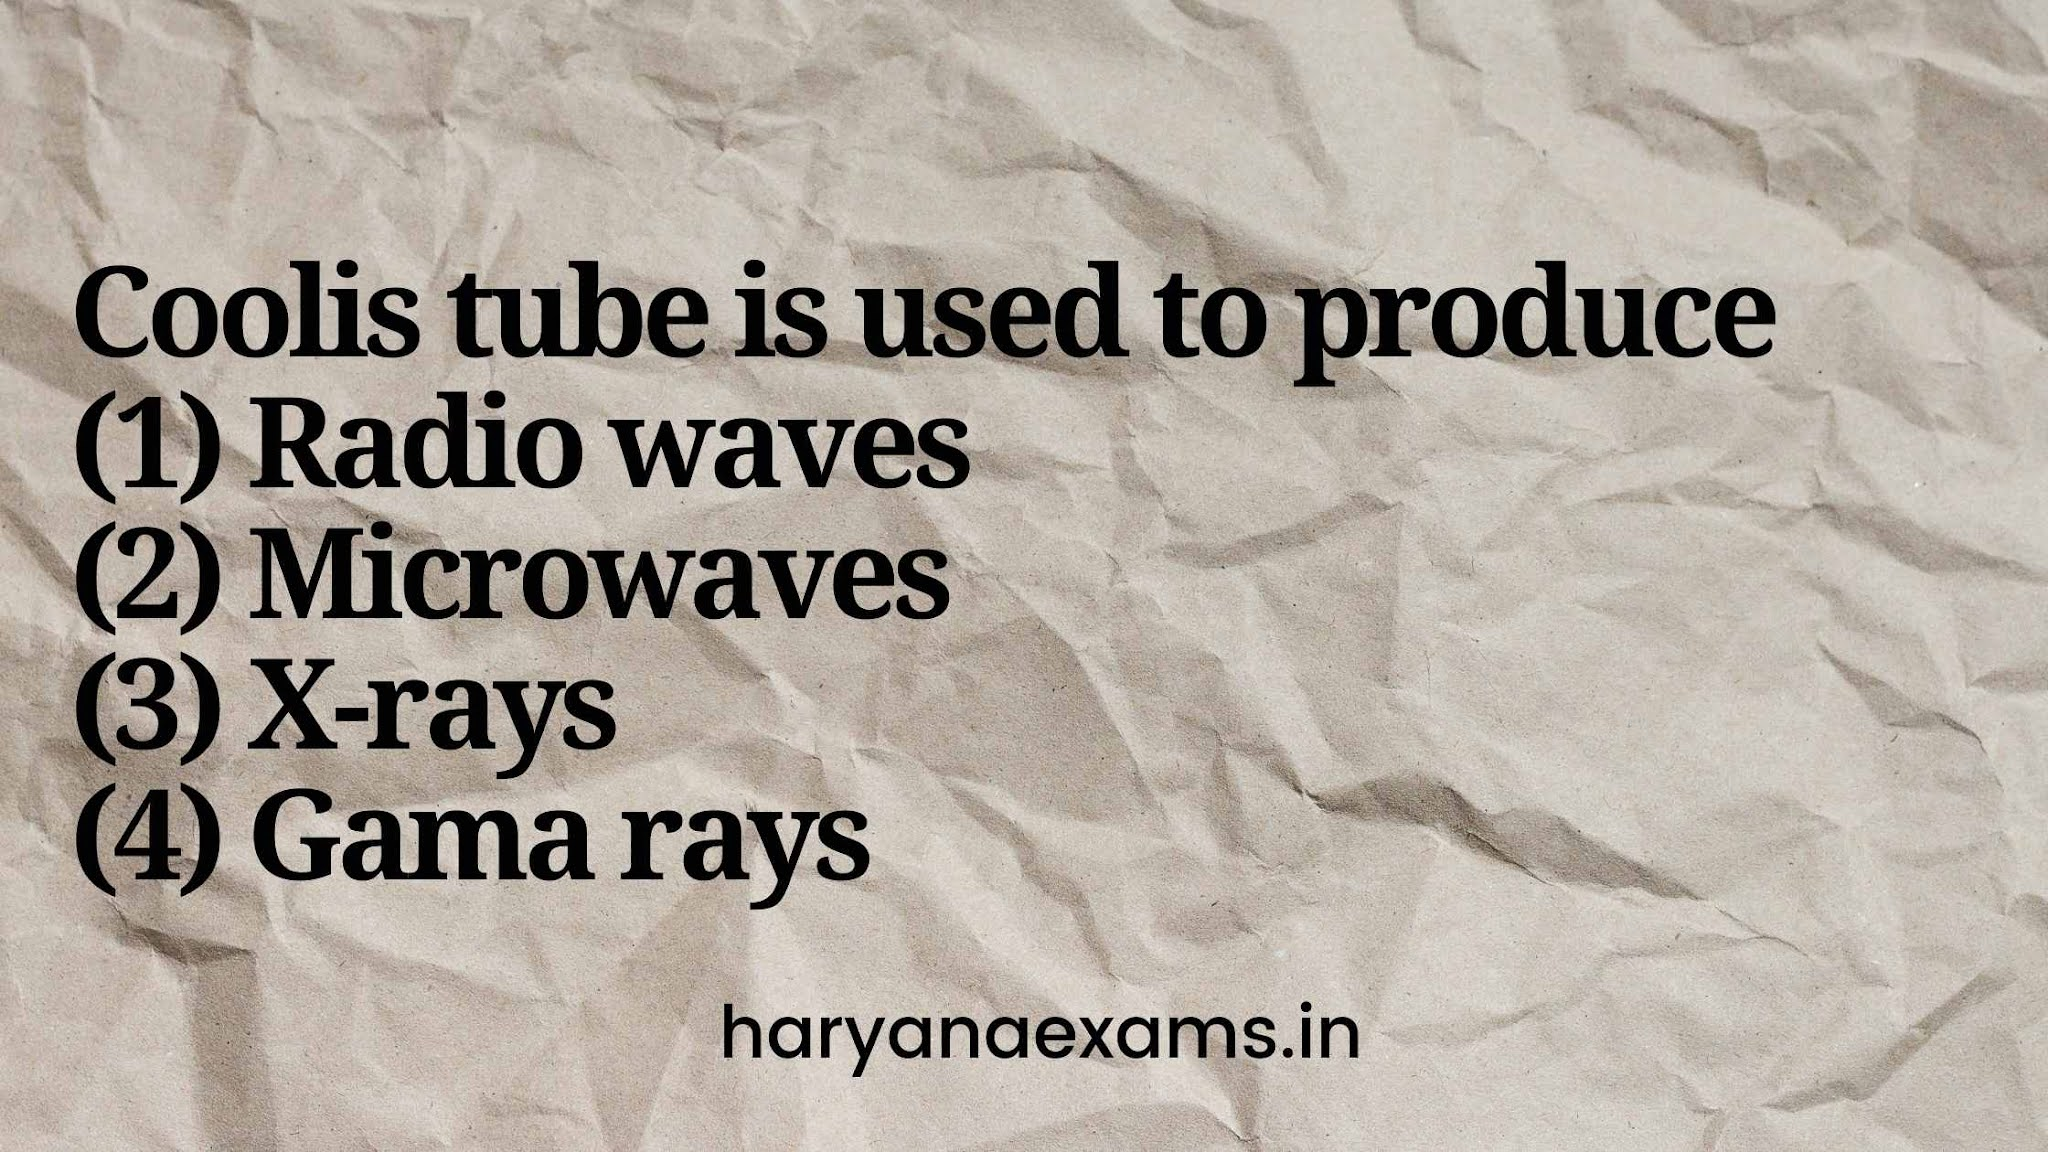 Coolis tube is used to produce   (1) Radio waves   (2) Microwaves   (3) X-rays   (4) Gama rays